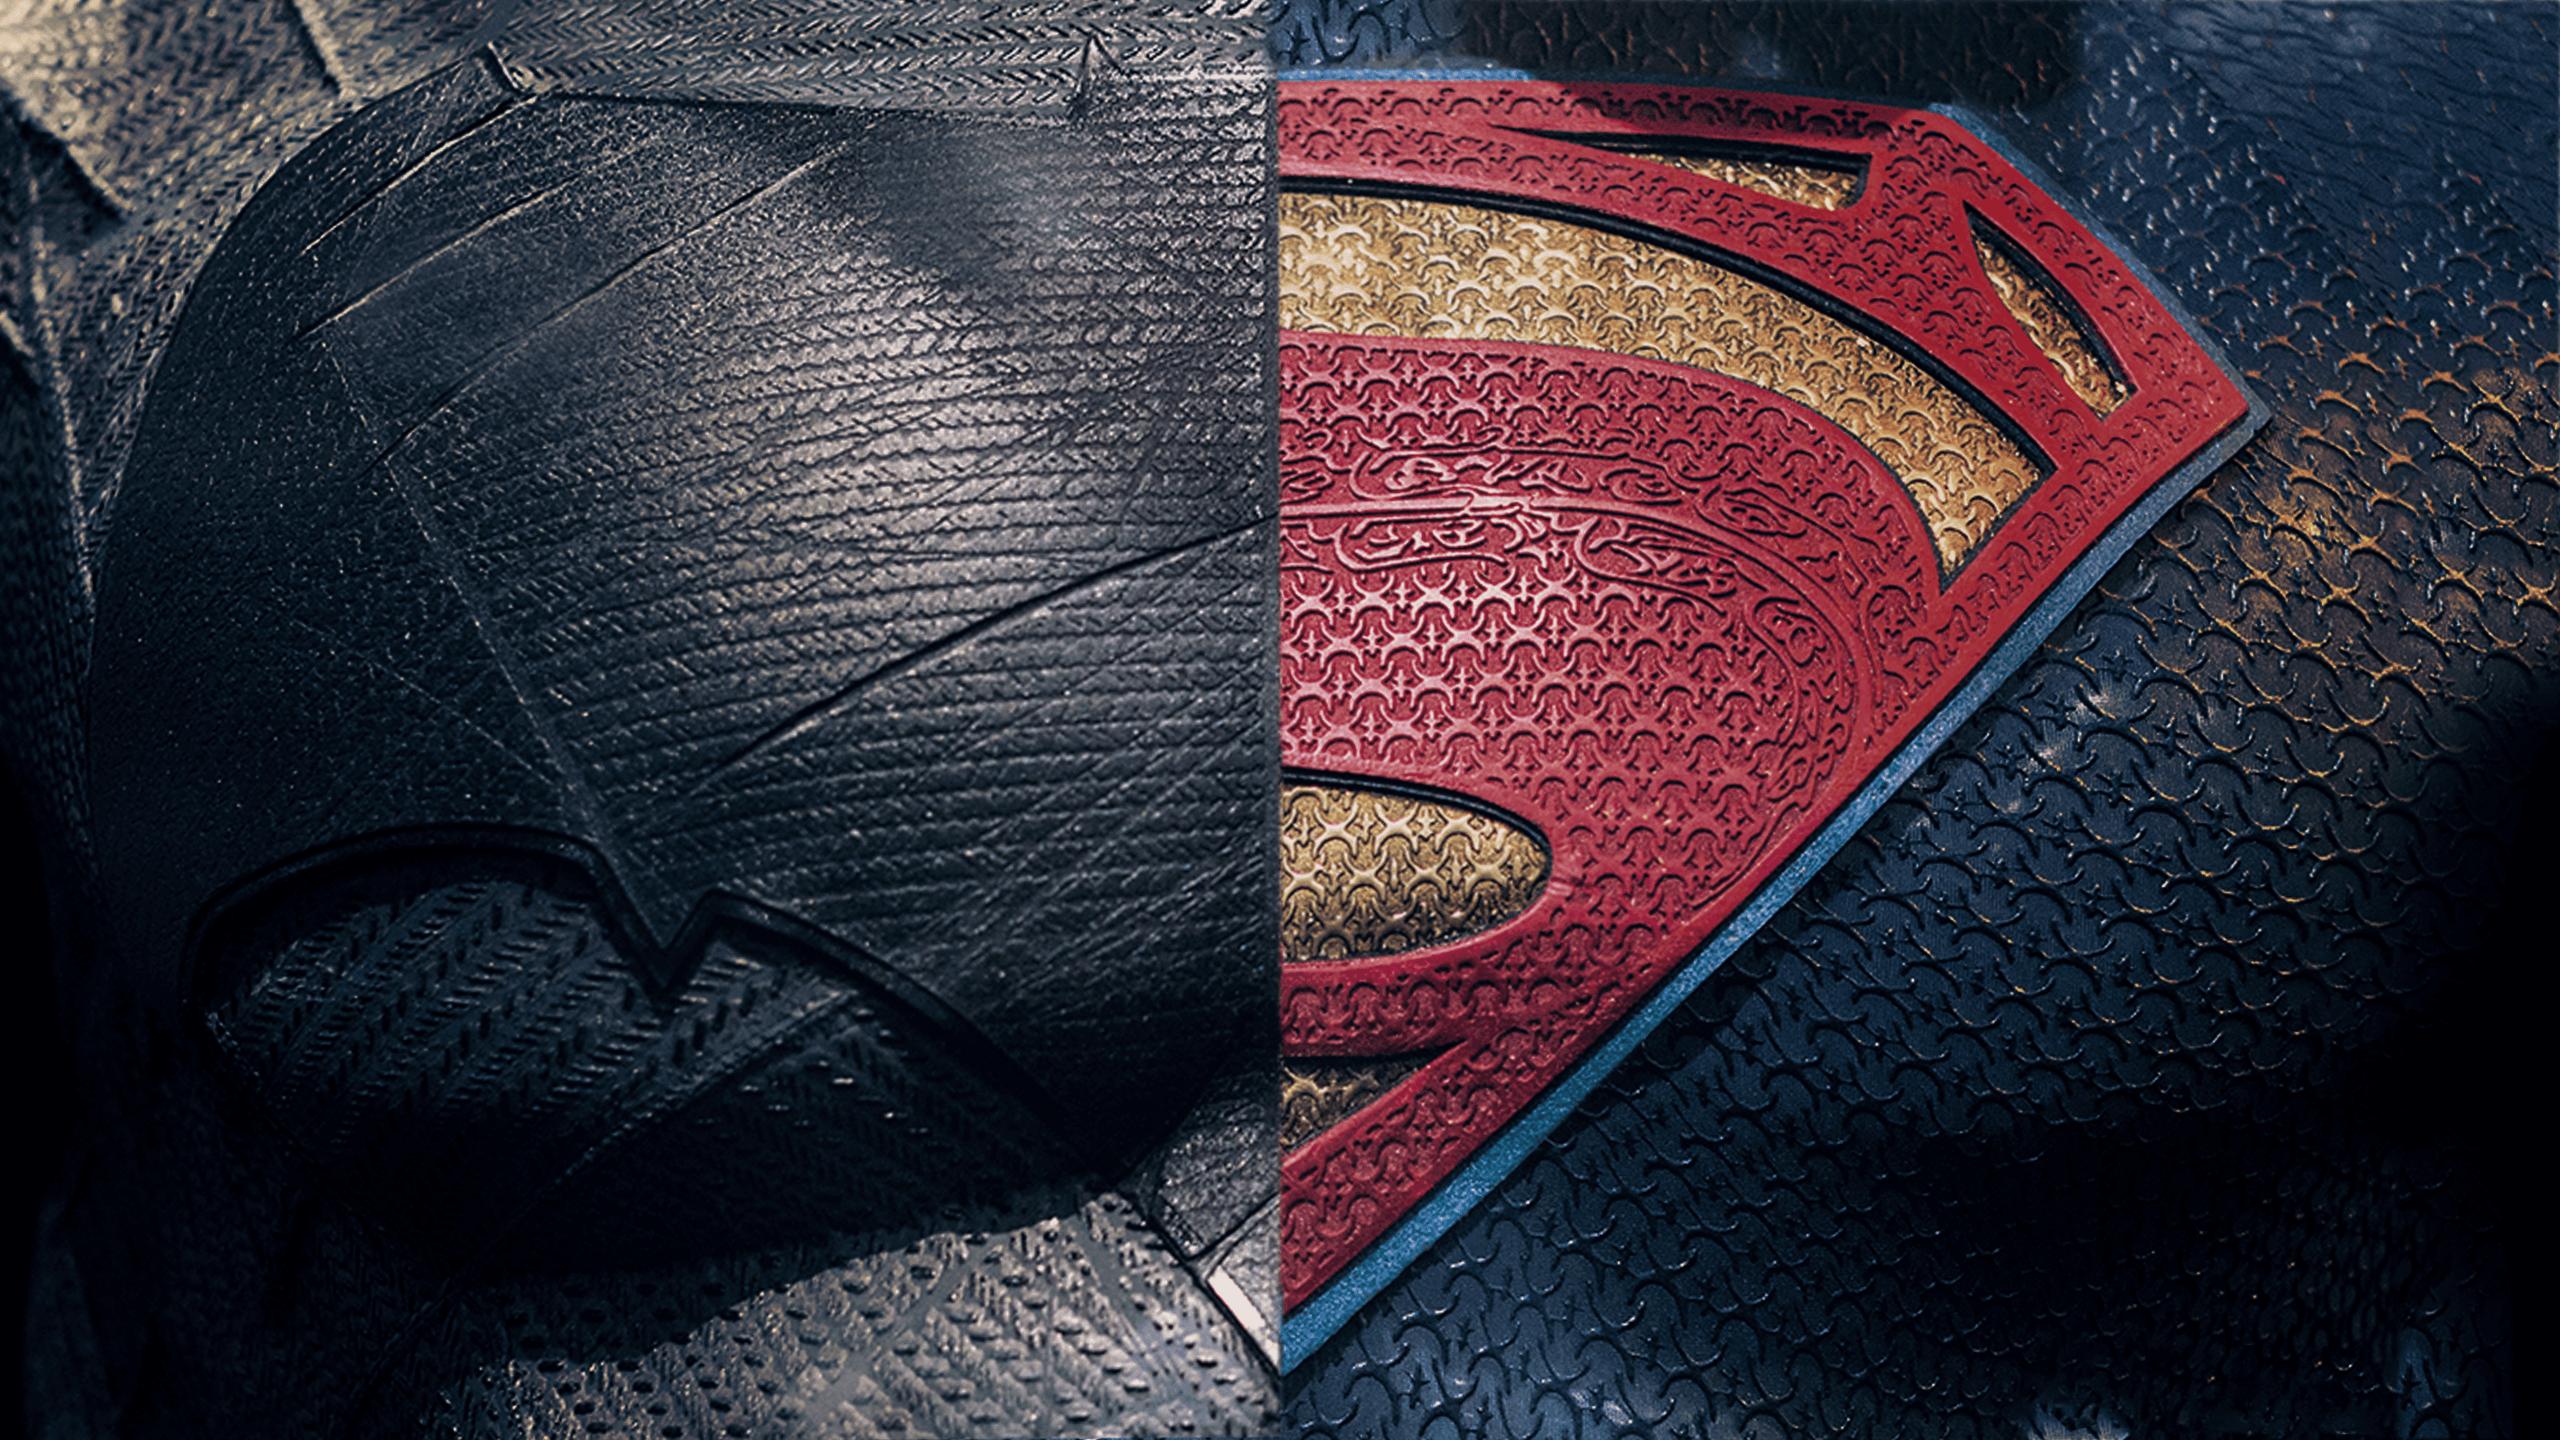 Batman Superman Logo Wallpaper (11078) - Wallpaperesque |Batman Superman Logo Wallpaper